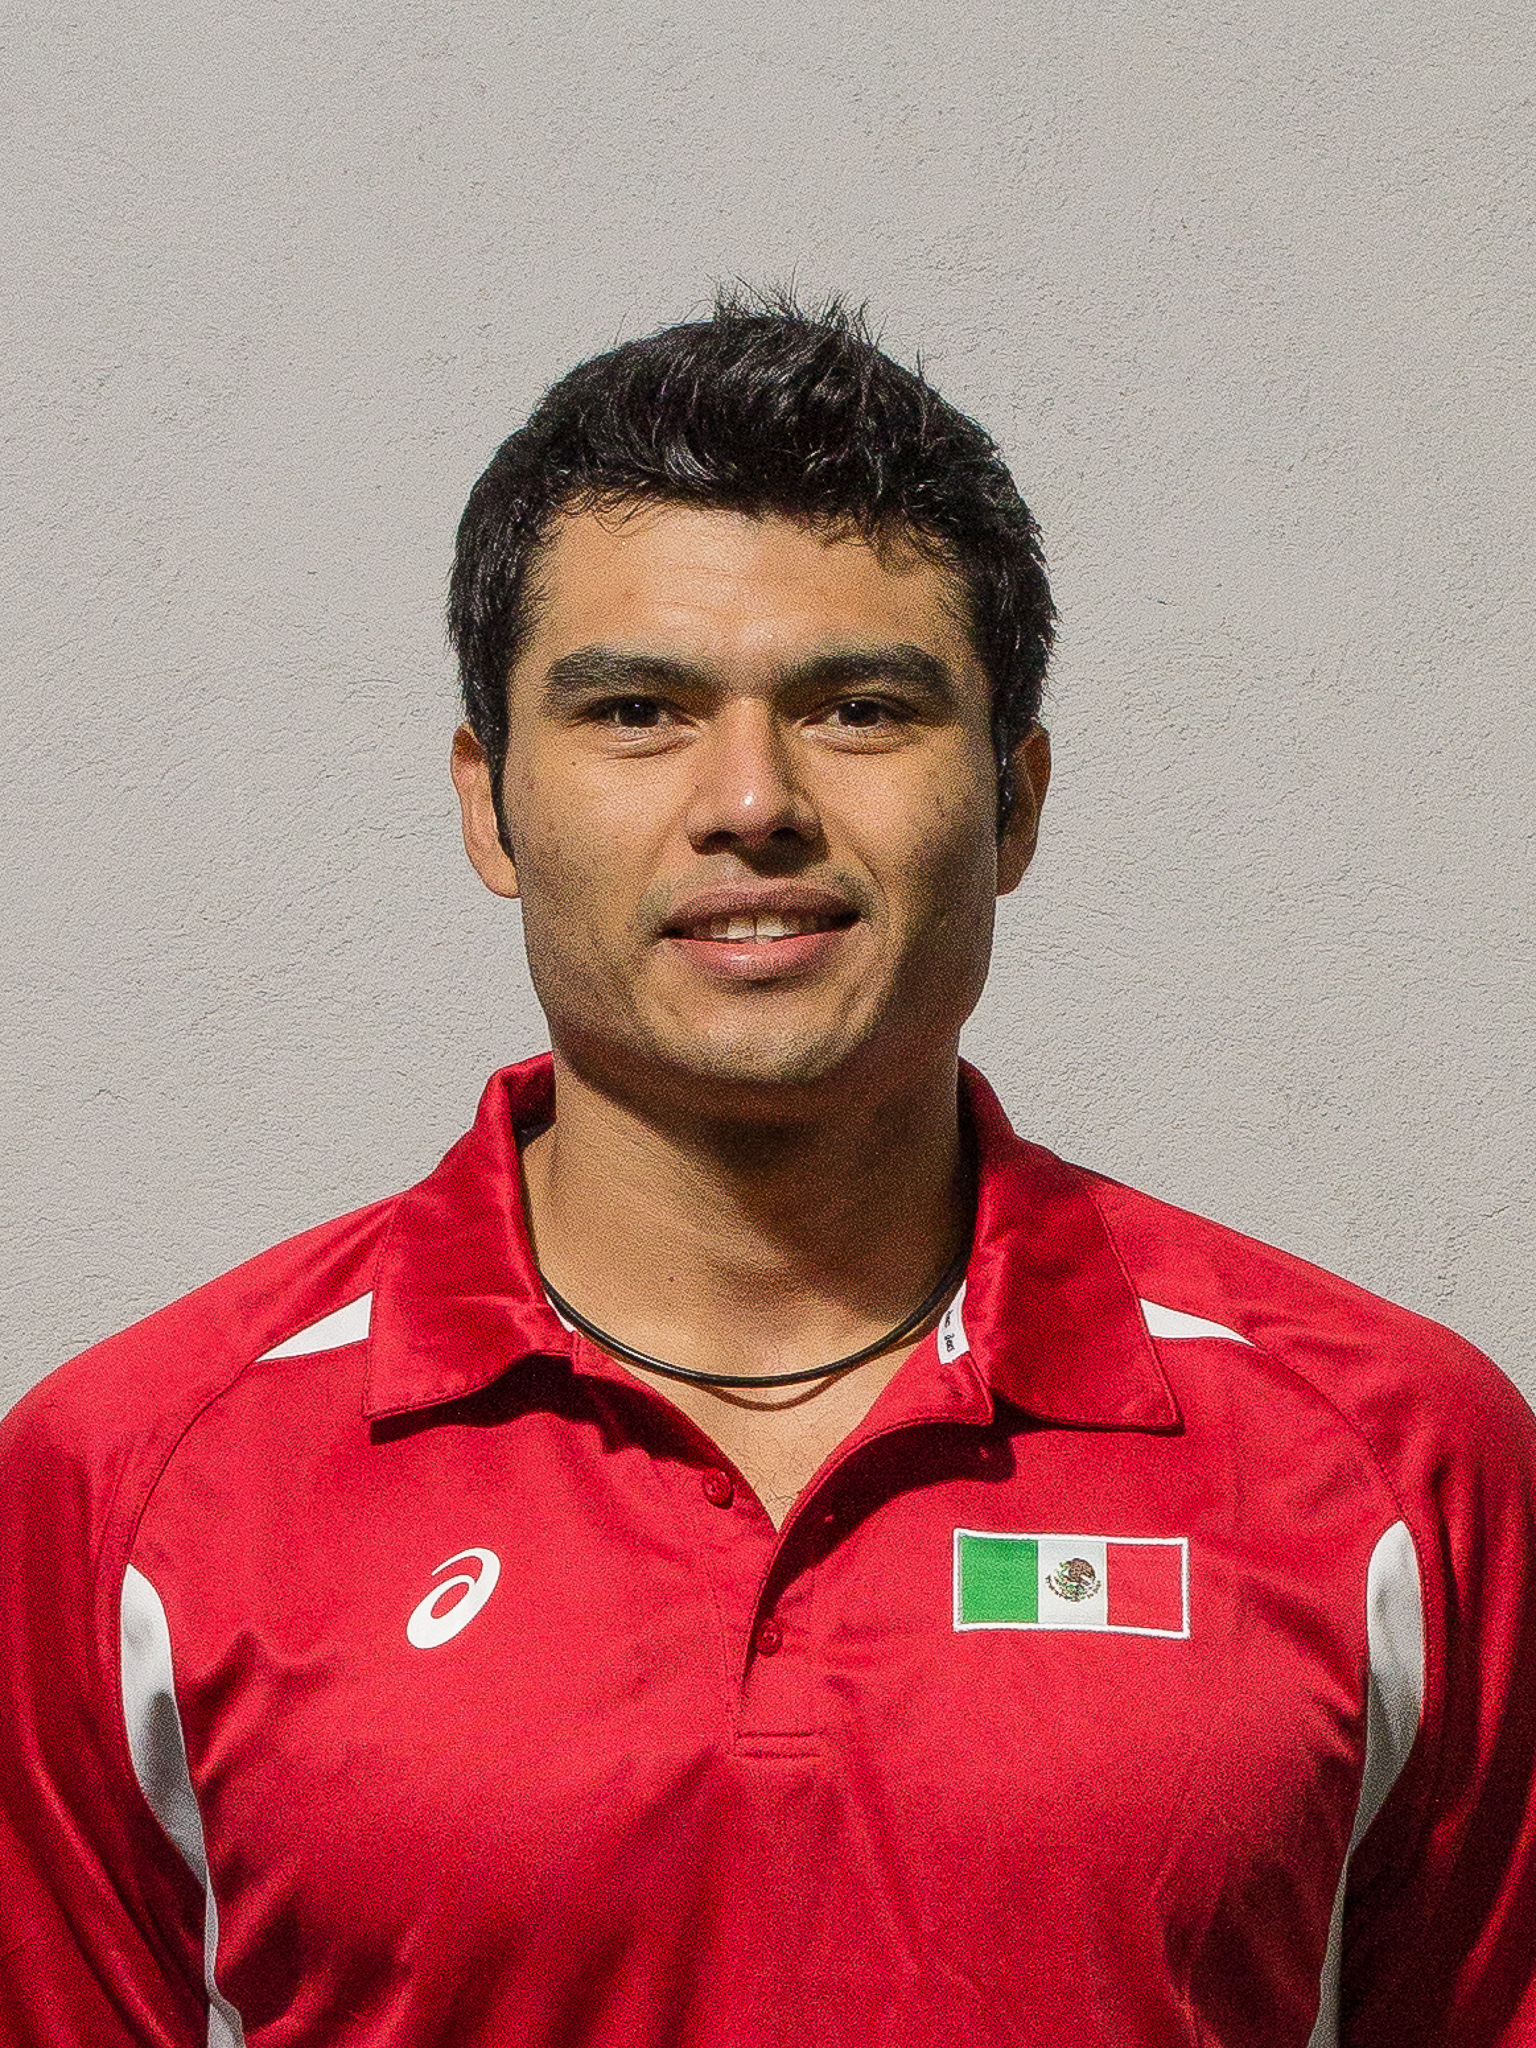 Gonzalo Ruiz De La Cruz